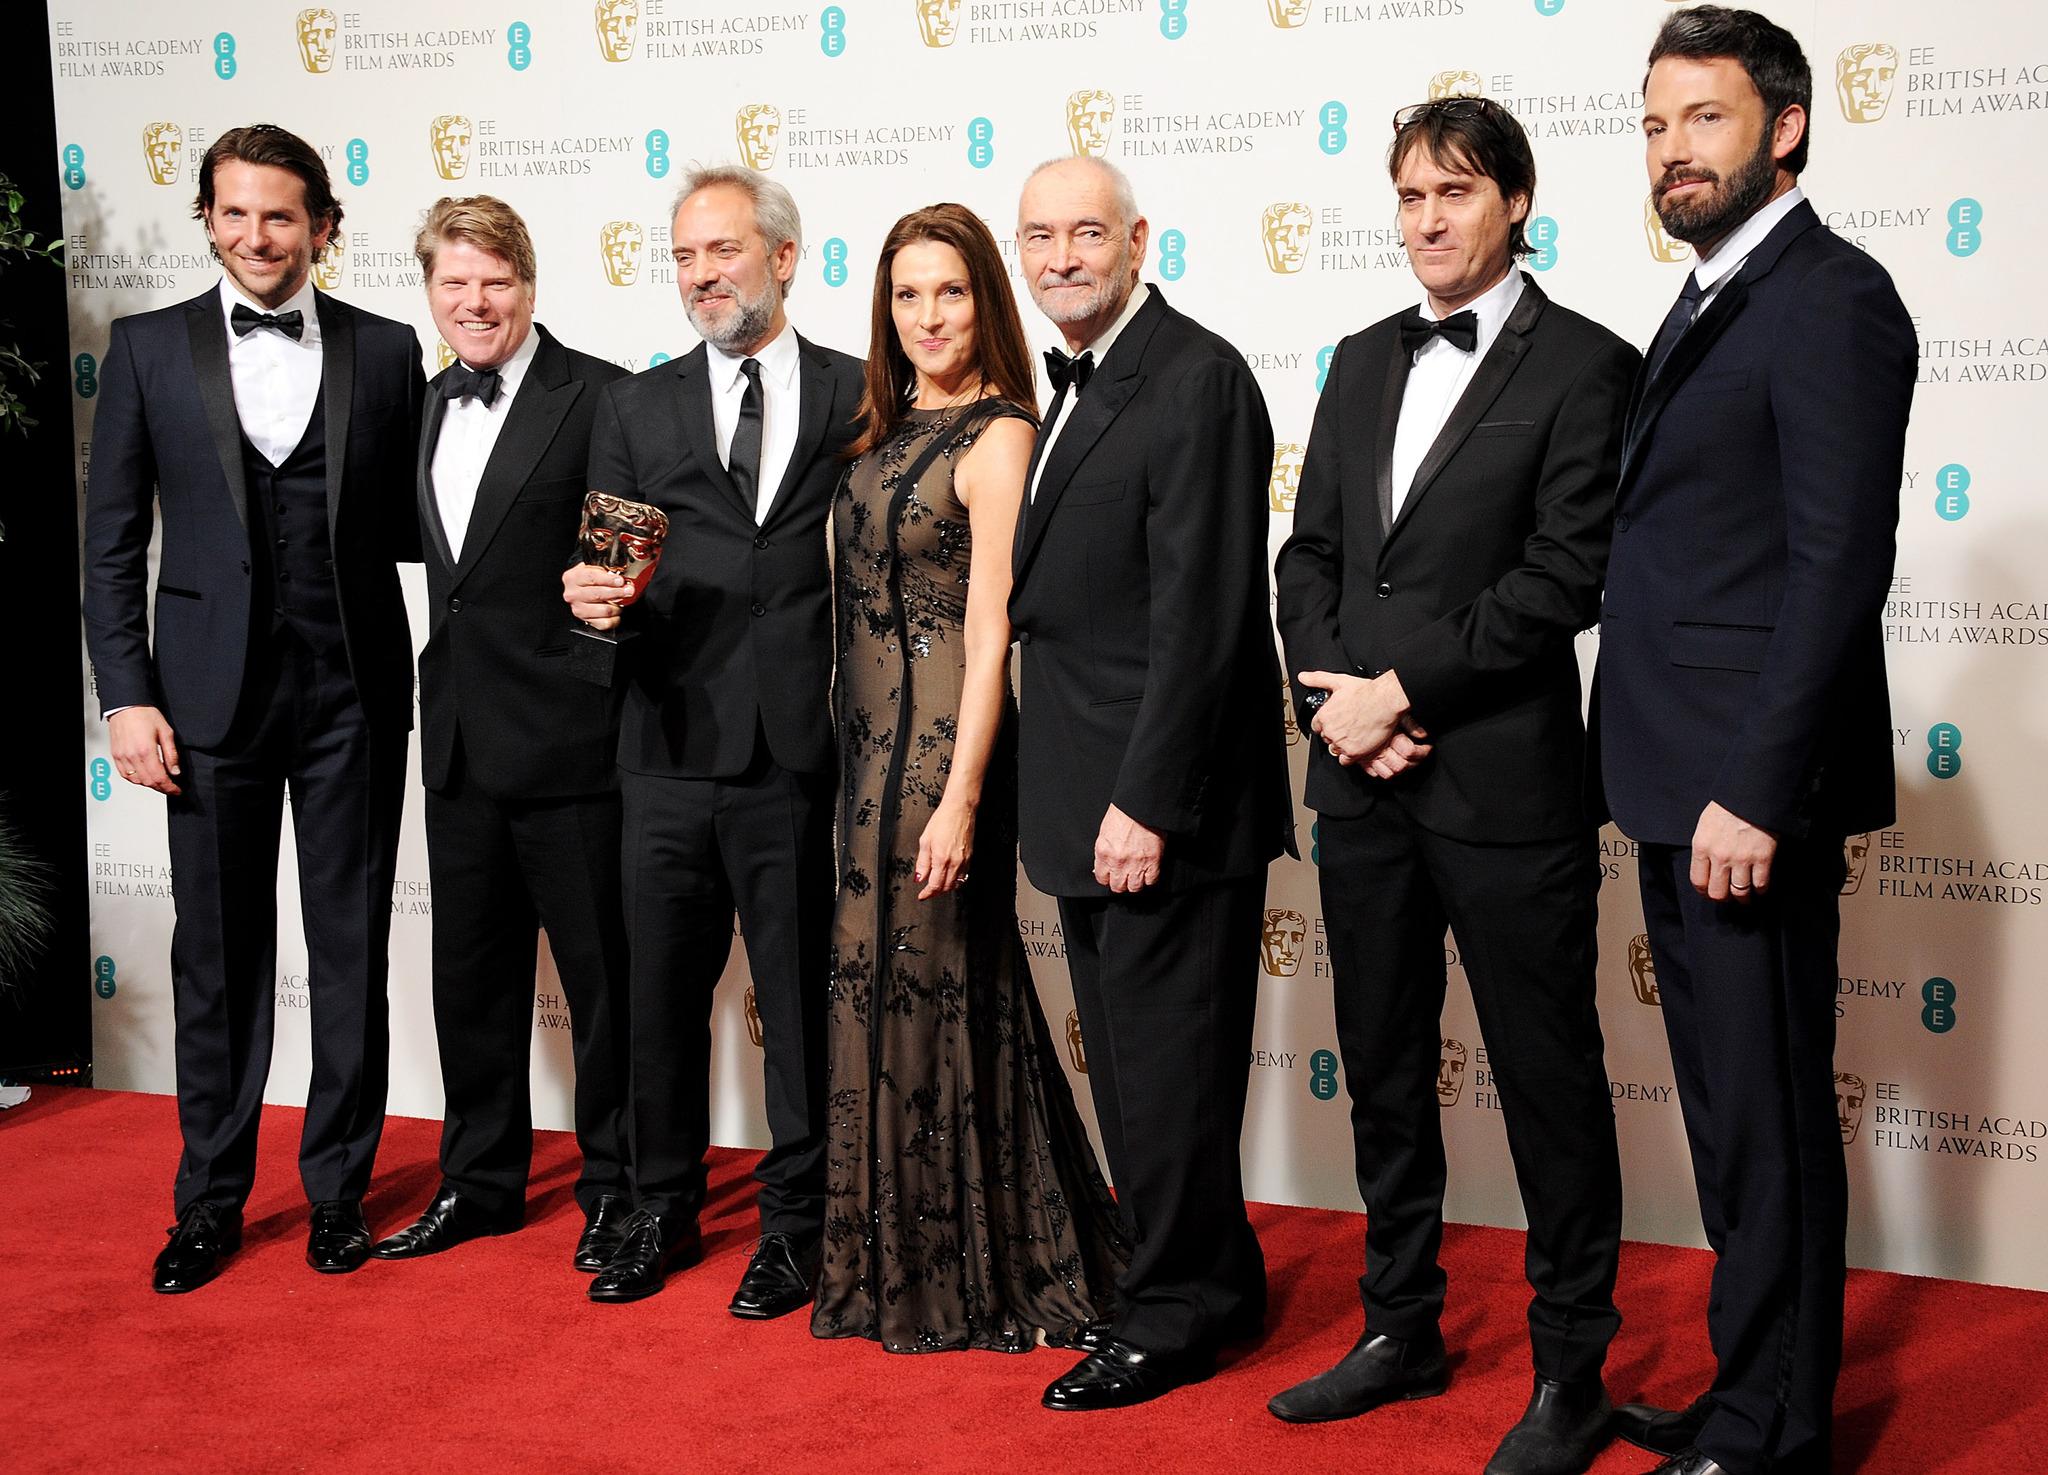 Ben Affleck, Sam Mendes, Barbara Broccoli, Bradley Cooper, Neal Purvis, Robert Wade, and Michael G. Wilson